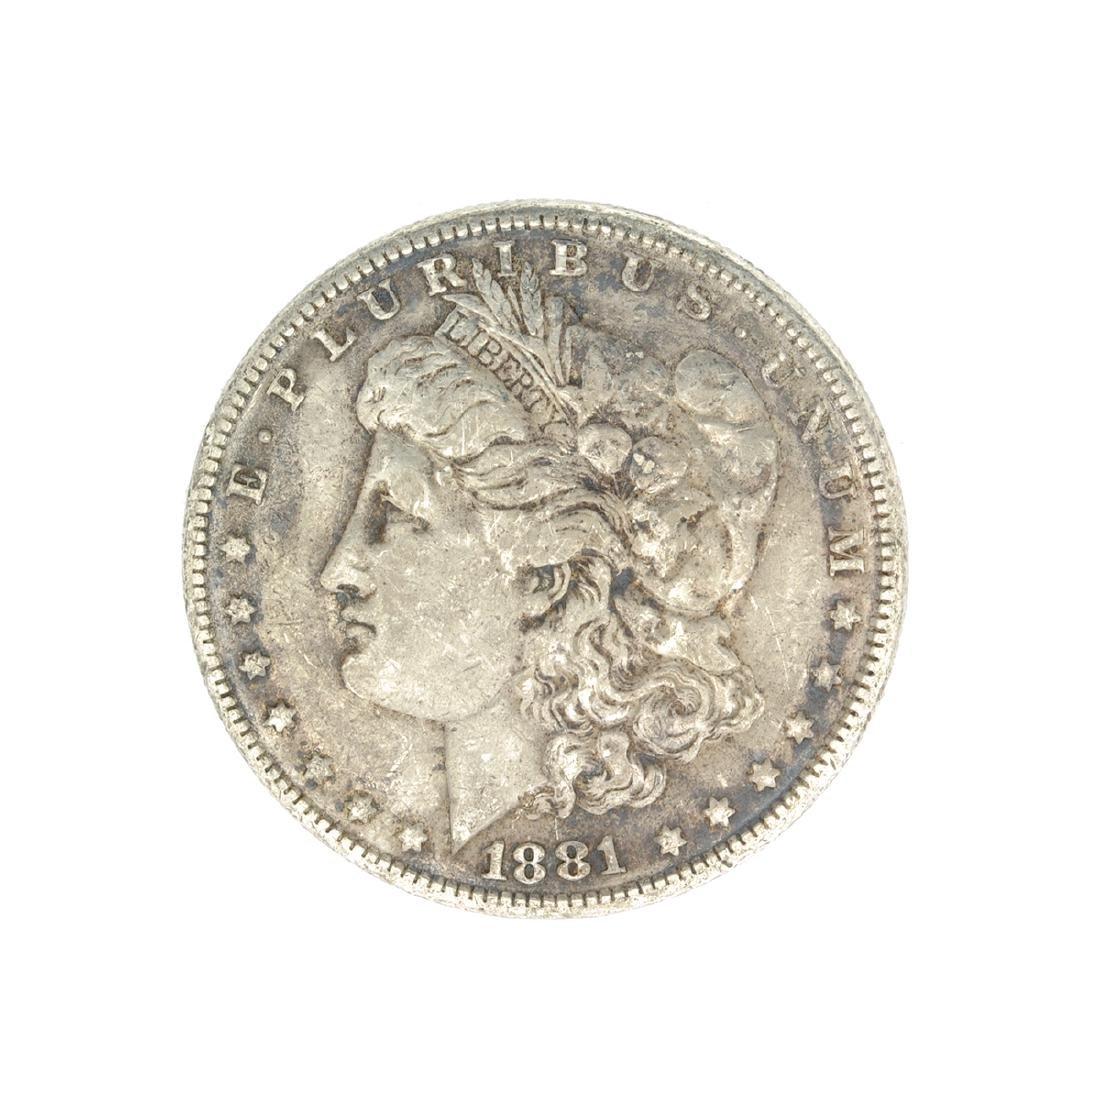 Rare 1881 U.S. Morgan Silver Dollar